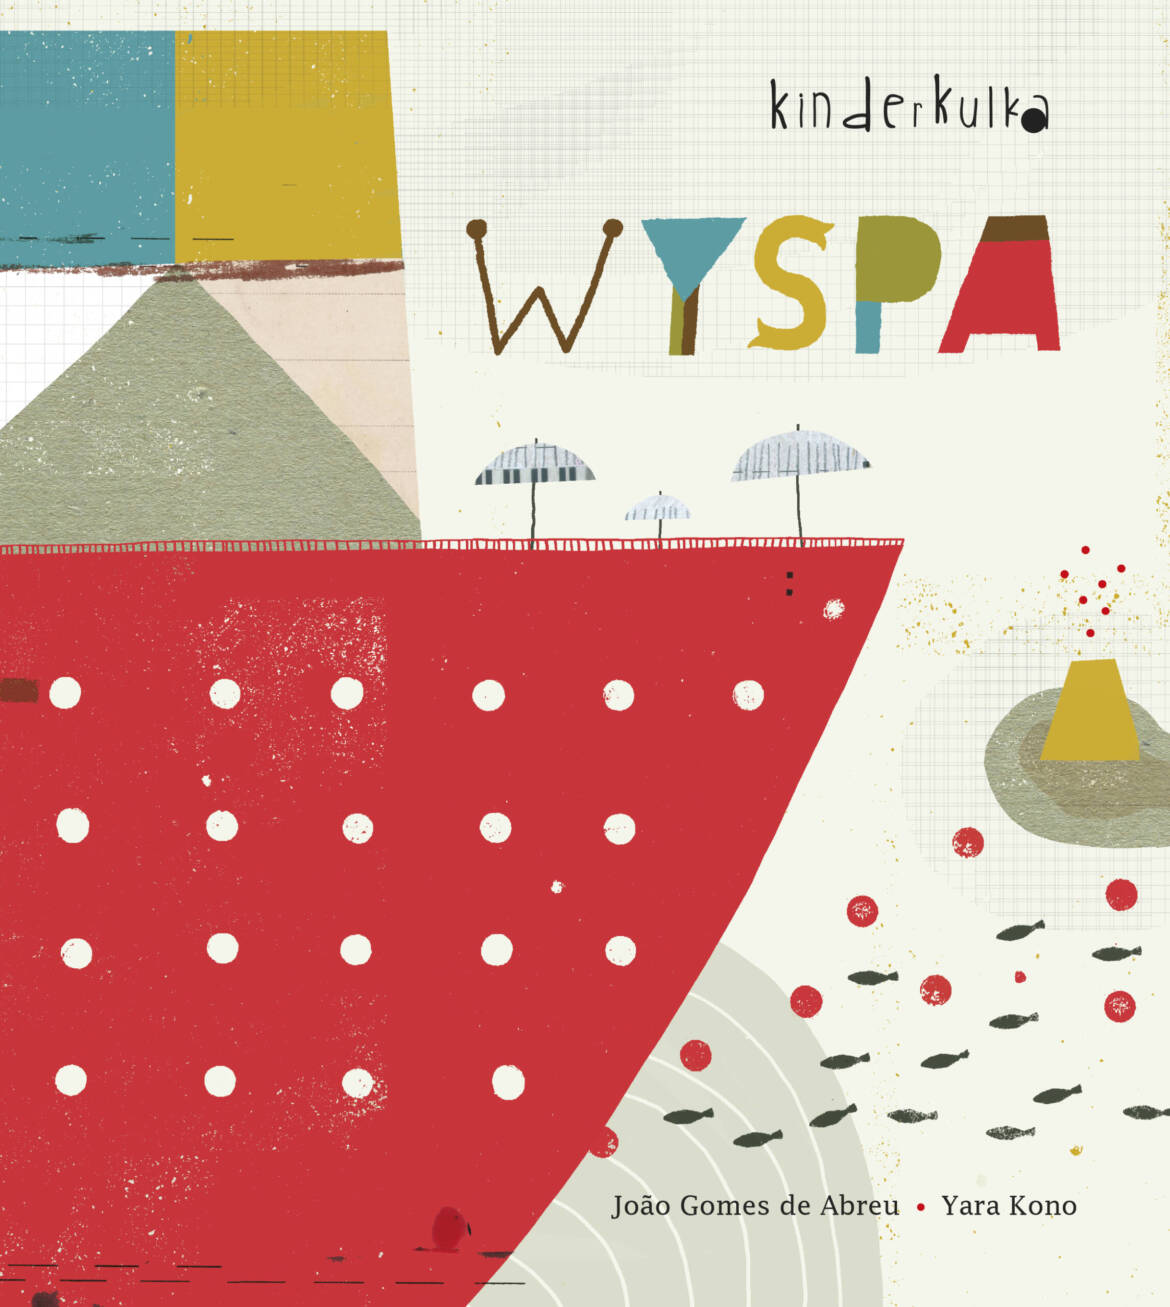 Wyspa_okladka_kinderkulka-scaled.jpg